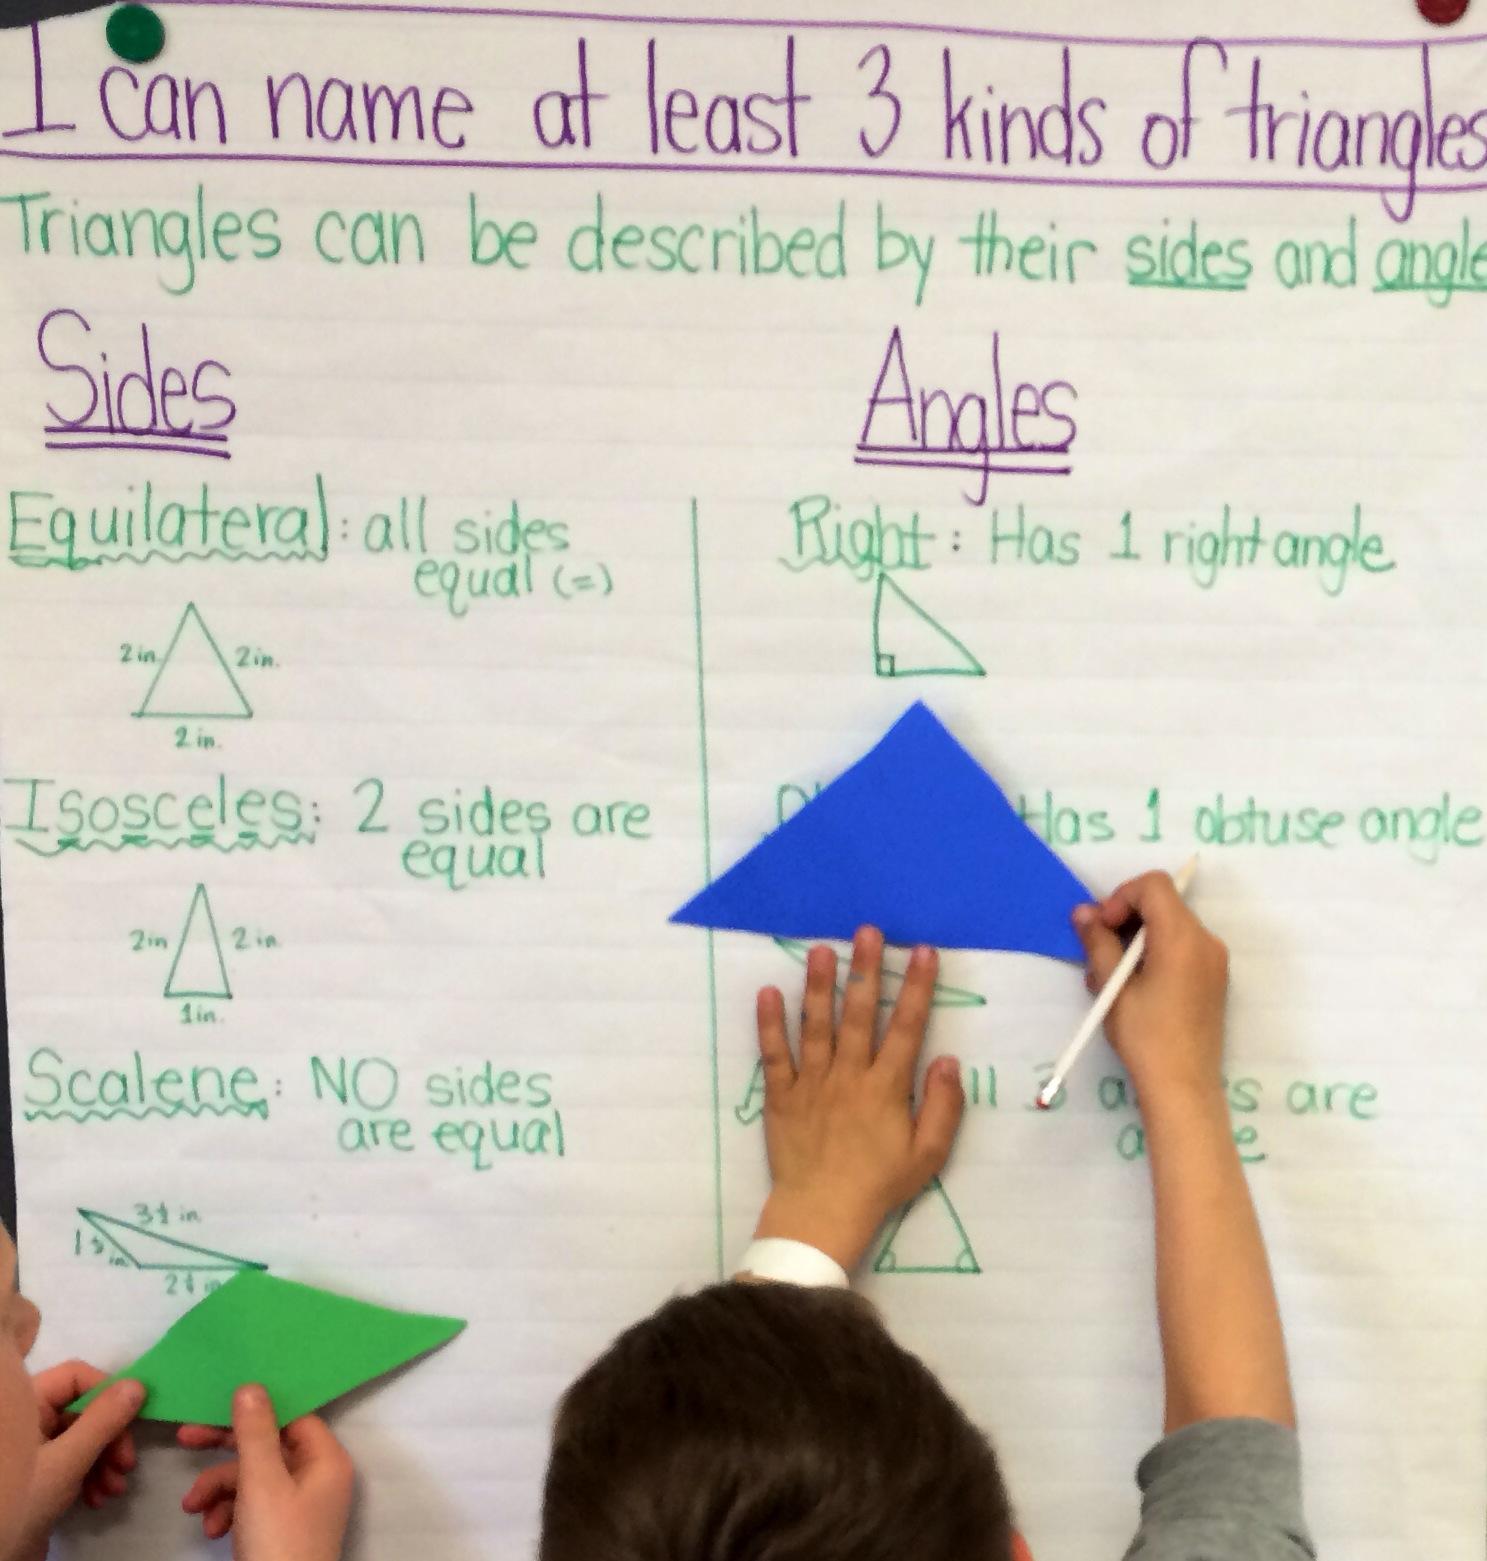 Classifying Shapes Using Tangrams